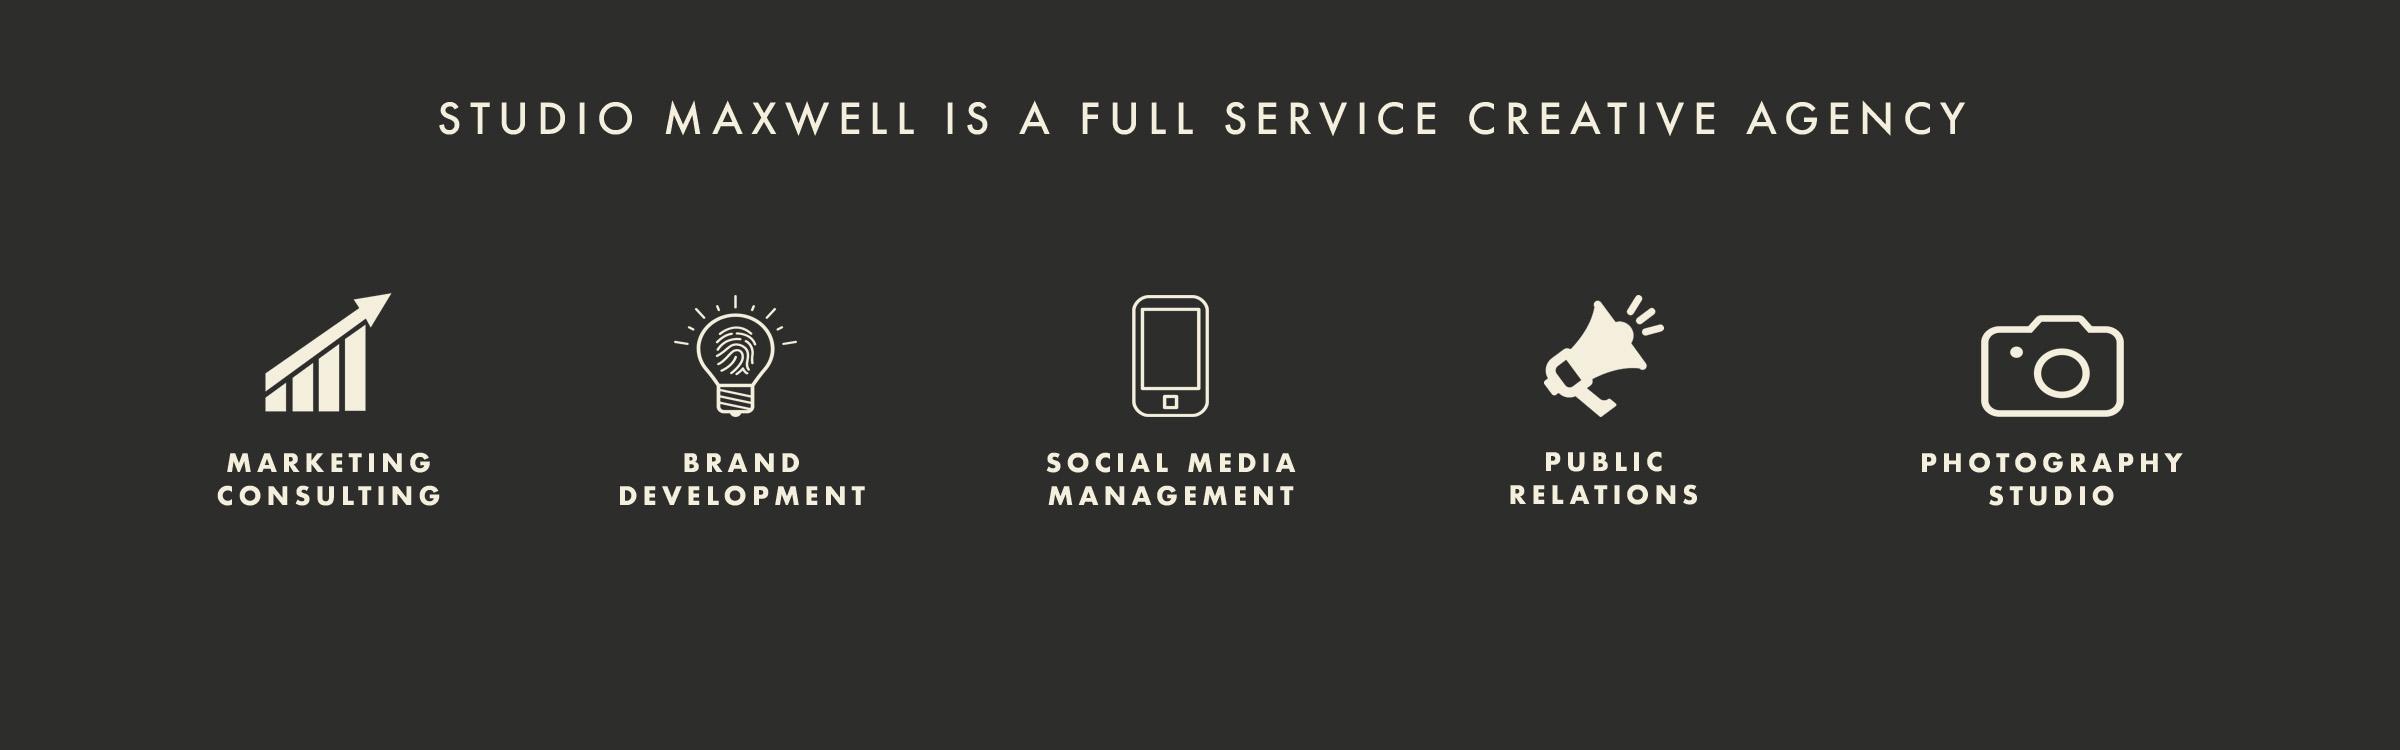 new service banner.jpg